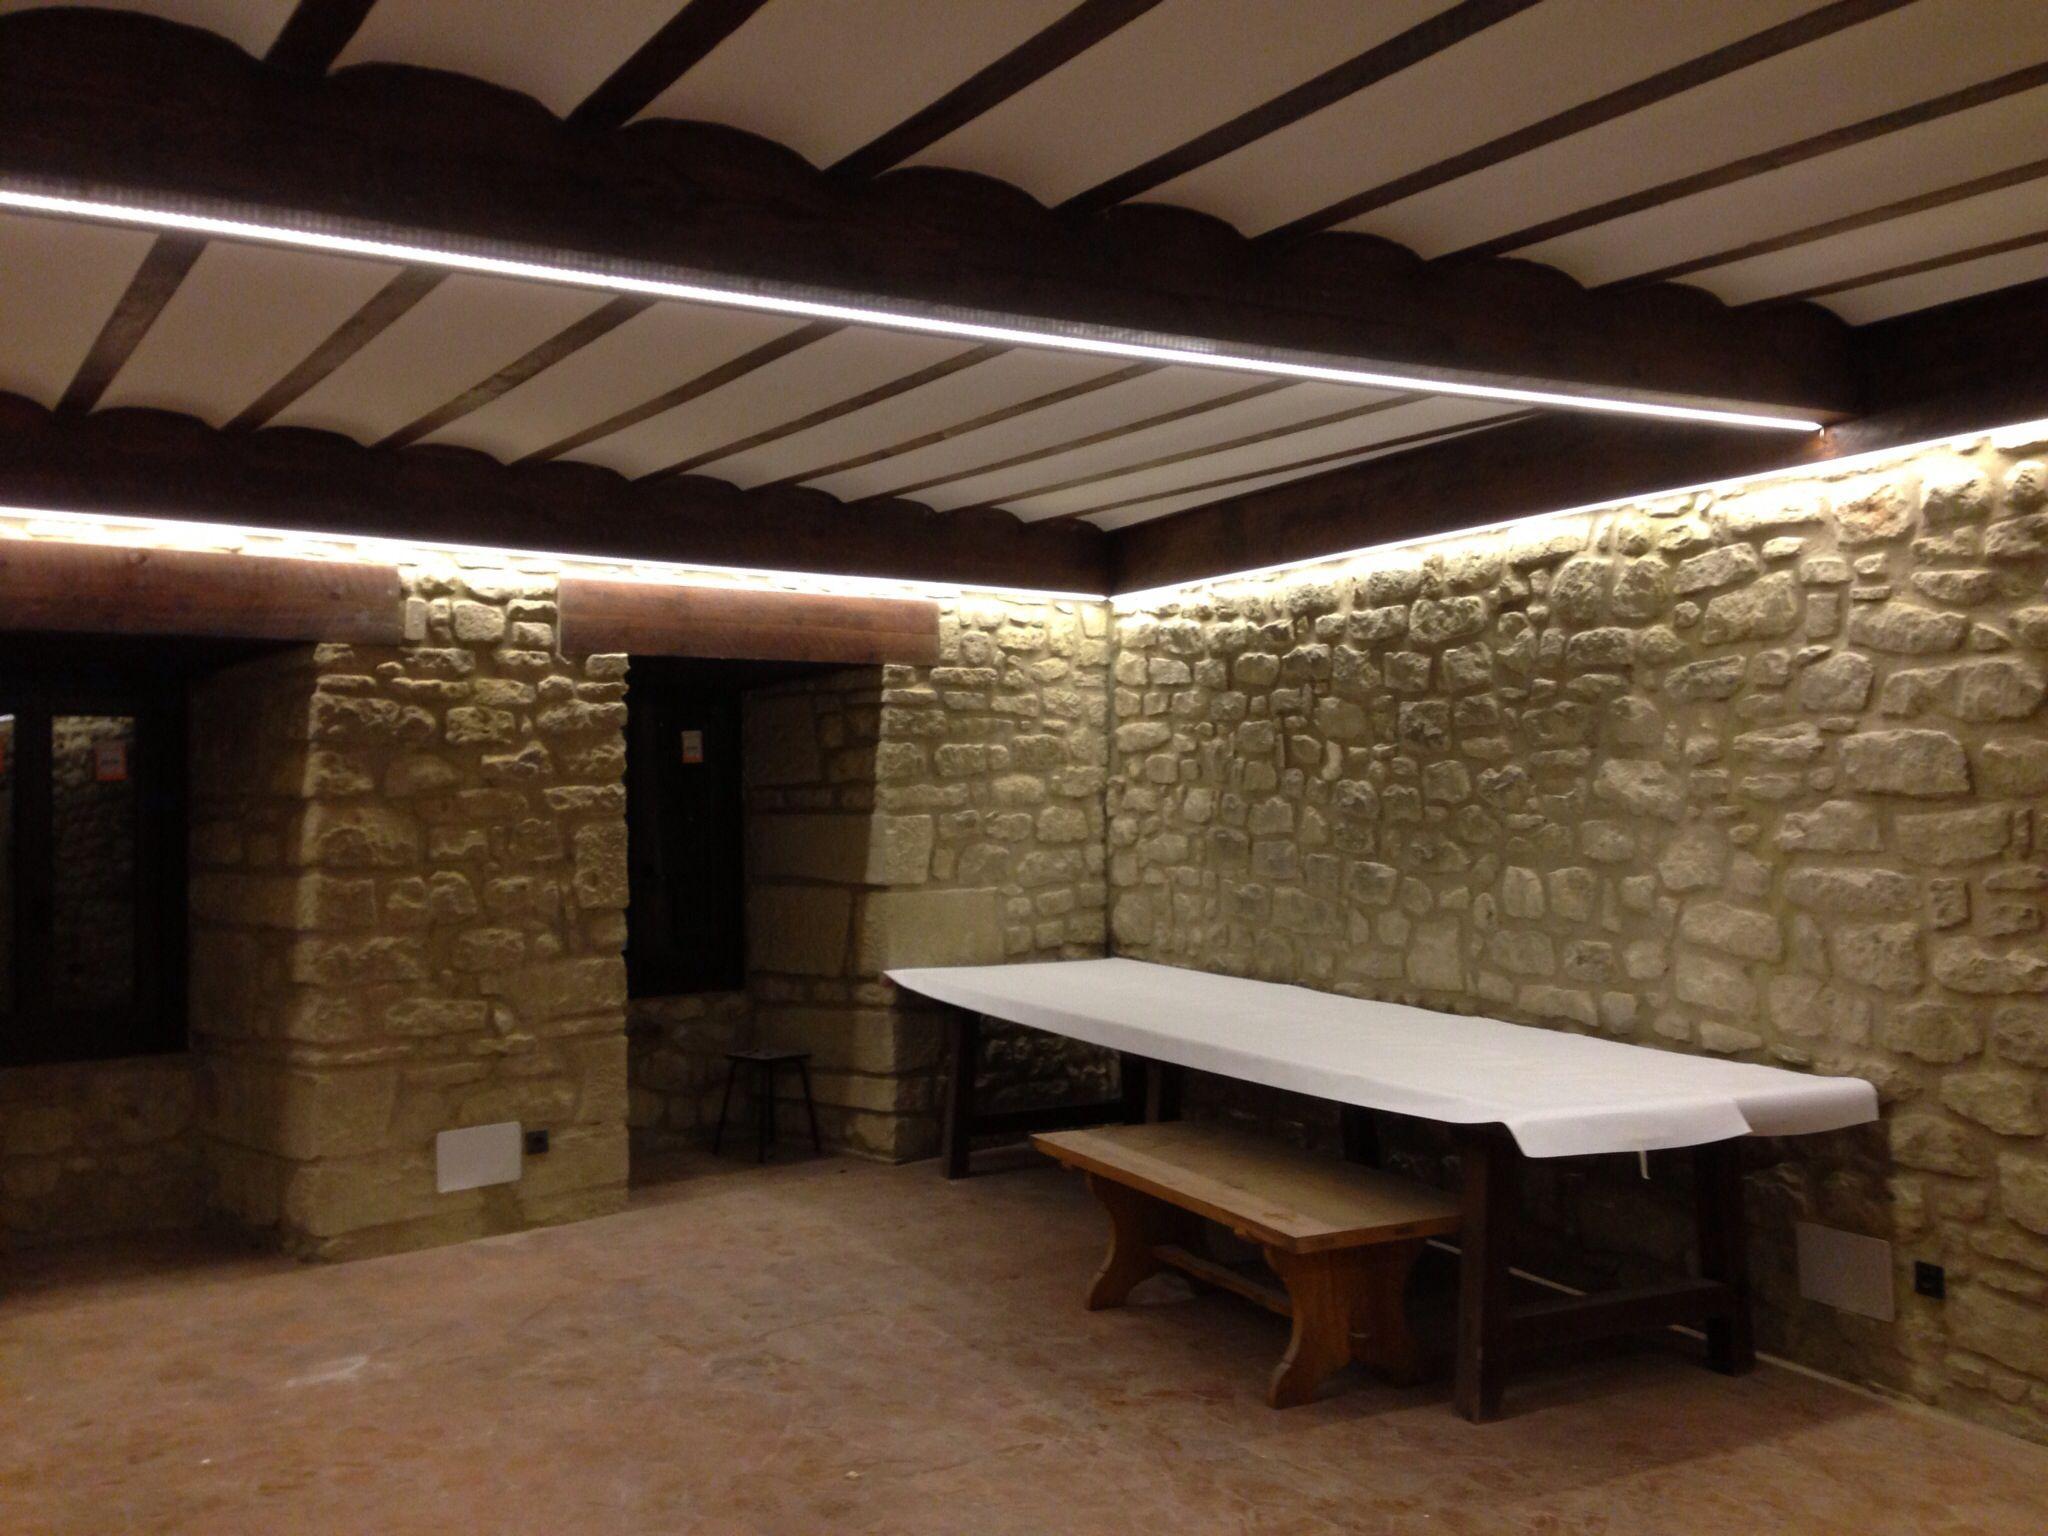 Txoko de paredes de piedra y vigas de madera iluminado - Iluminacion tiras led ...